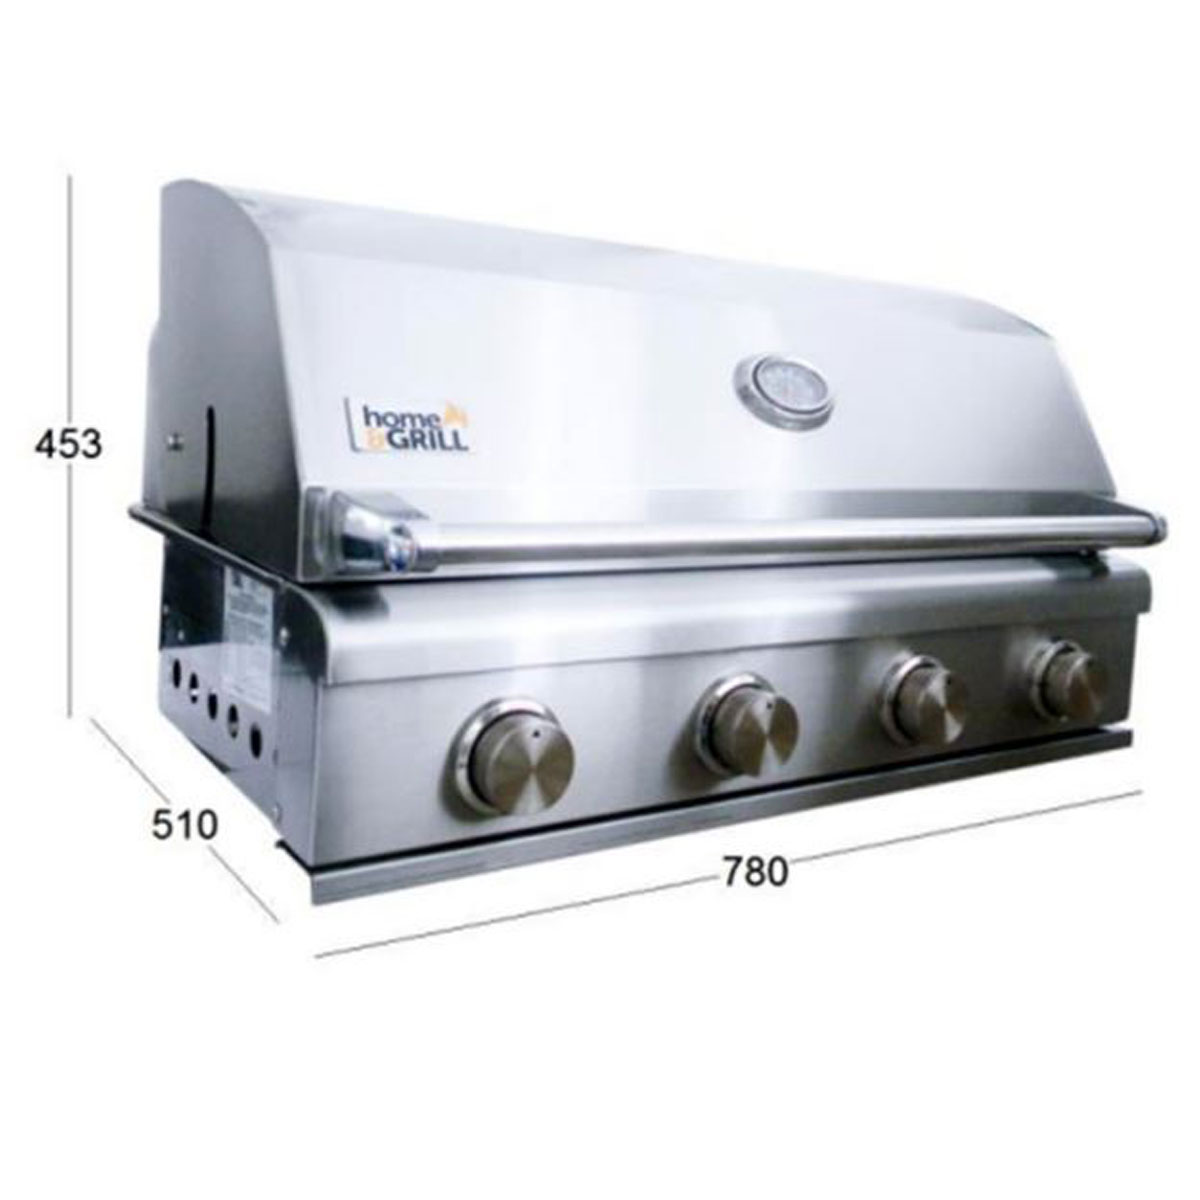 Churrasqueira A Gás 4 Queimadores Home Grill Smart  - Sua Casa Gourmet e Cia